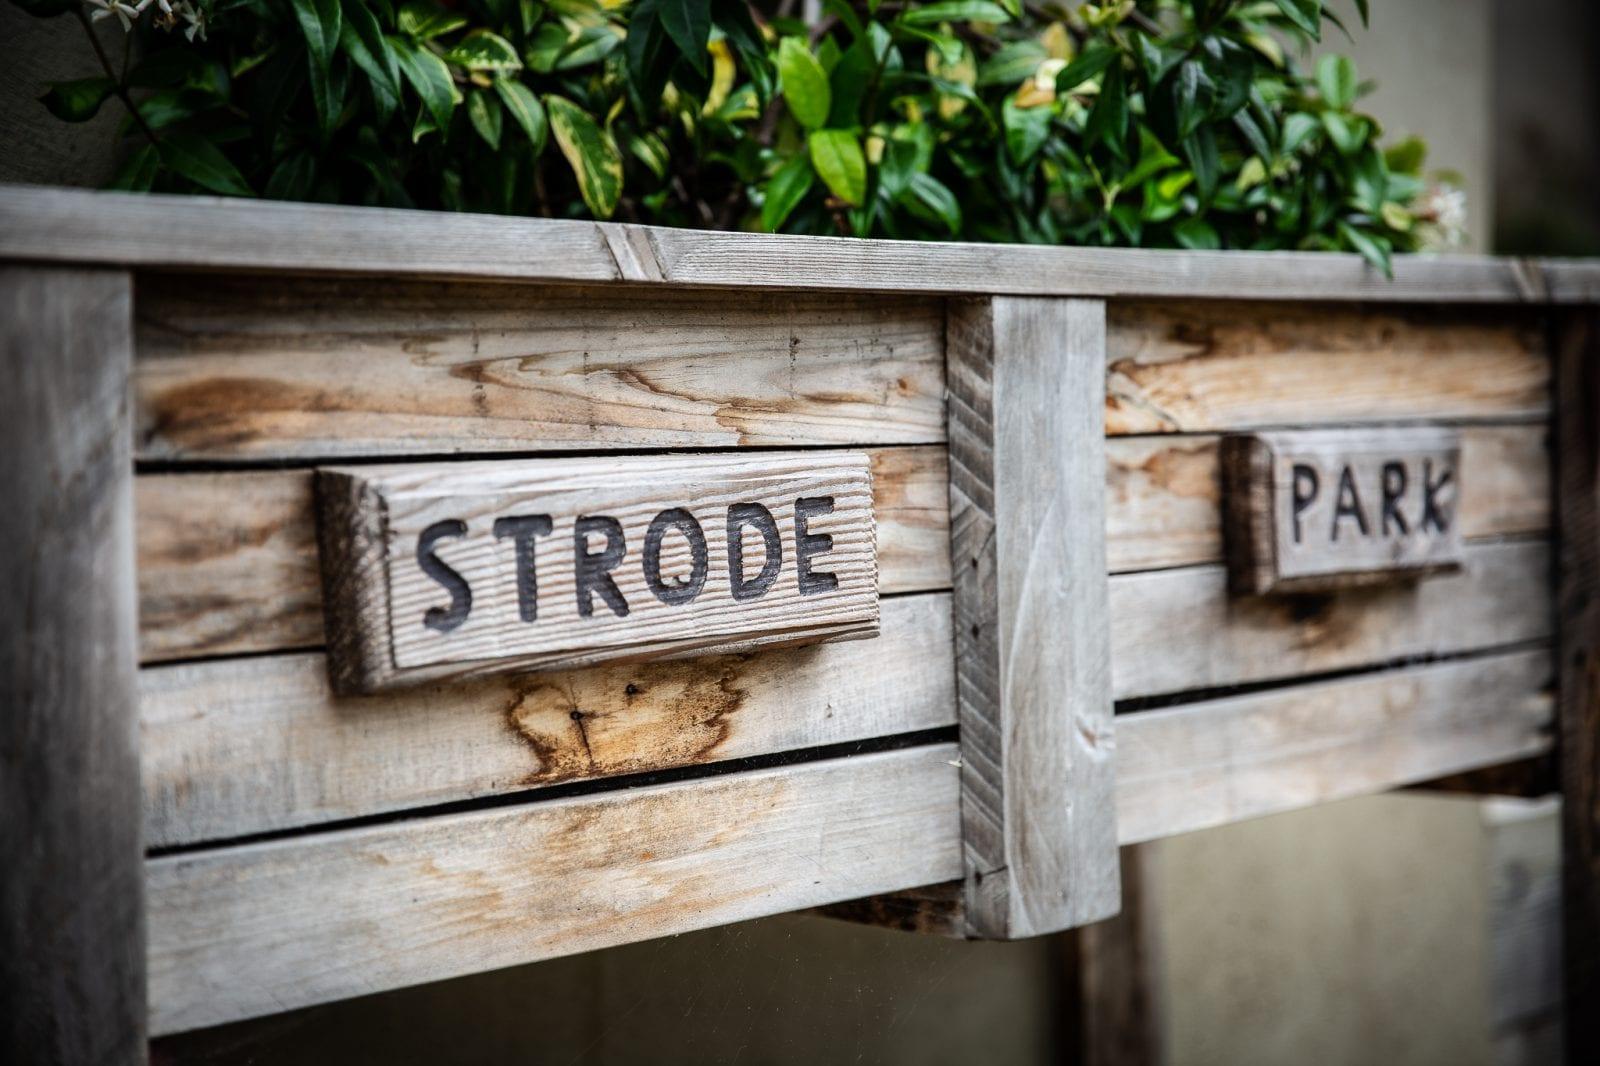 Strode Park planter